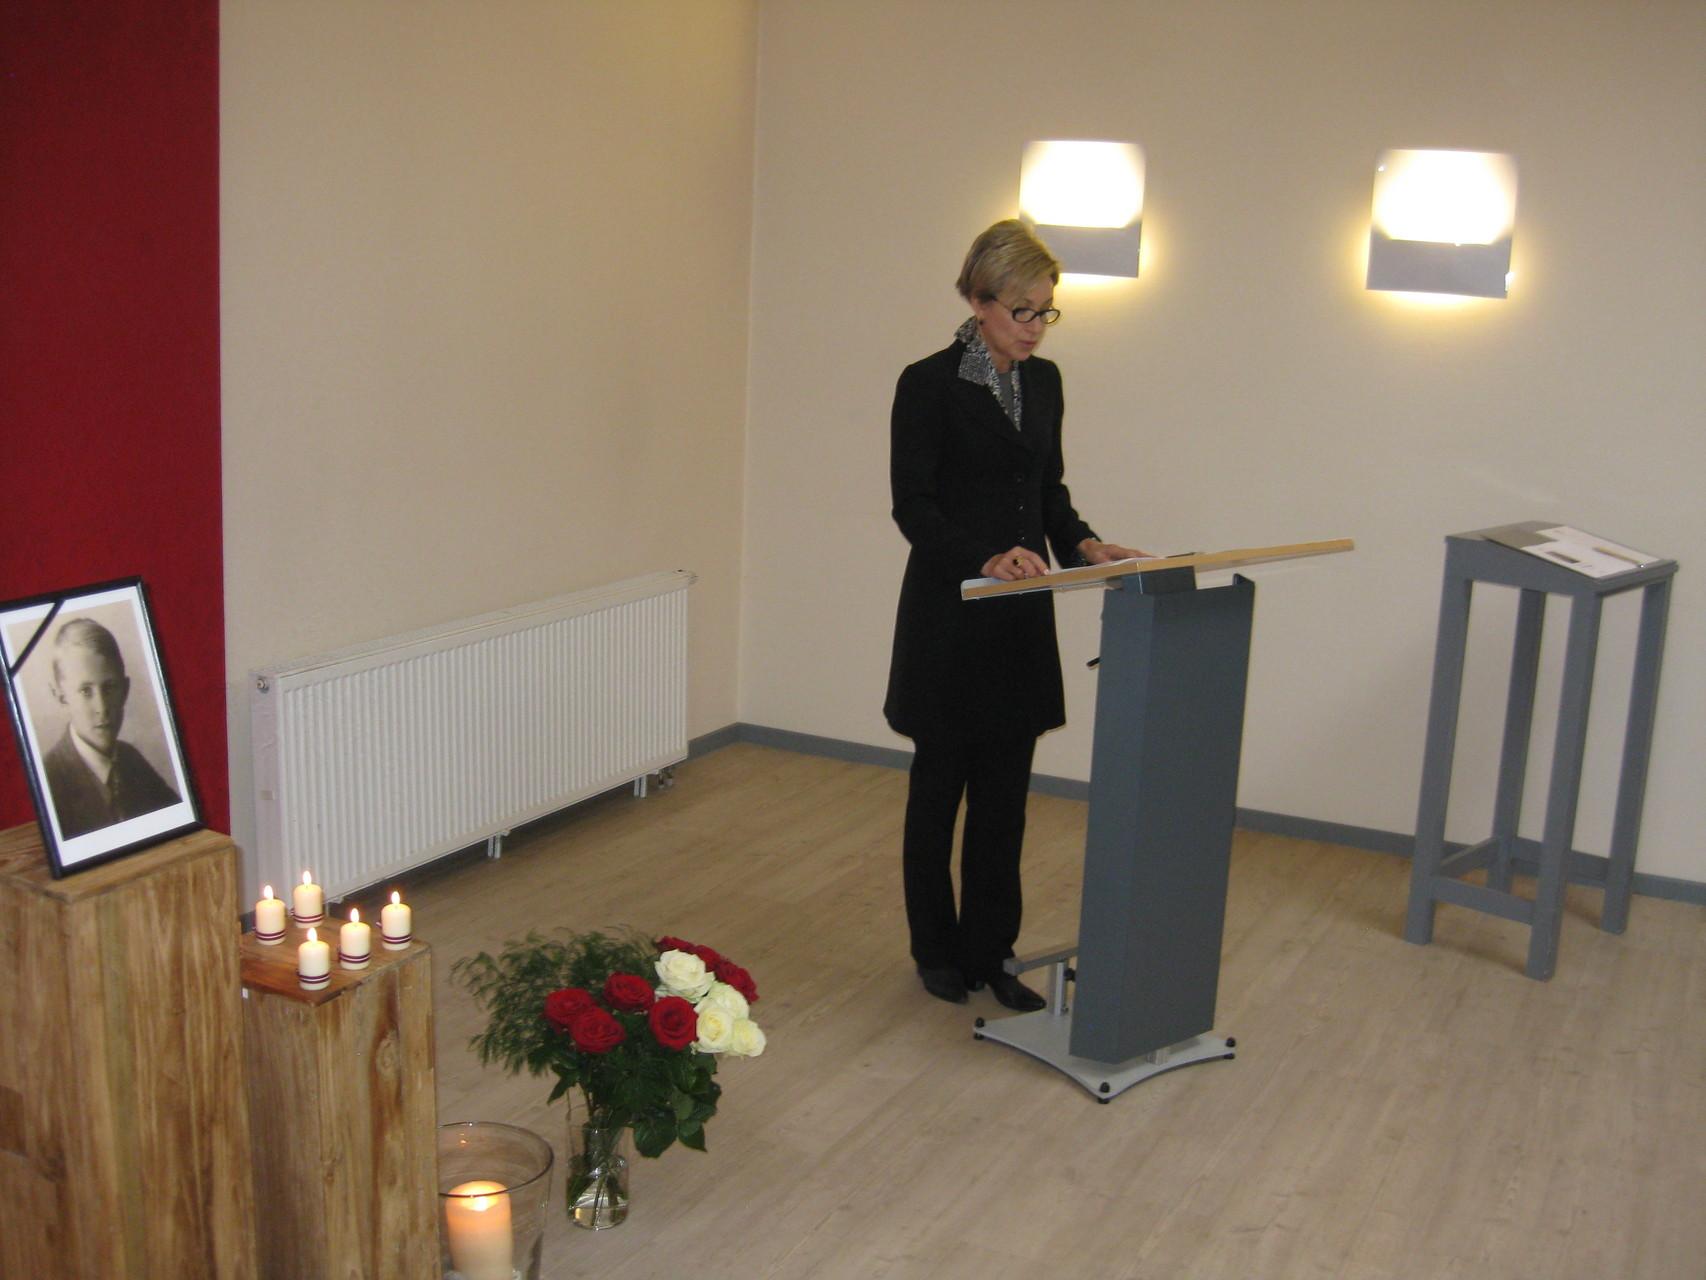 Latvijas Republikas vēstniece E. Kuzmas uzruna